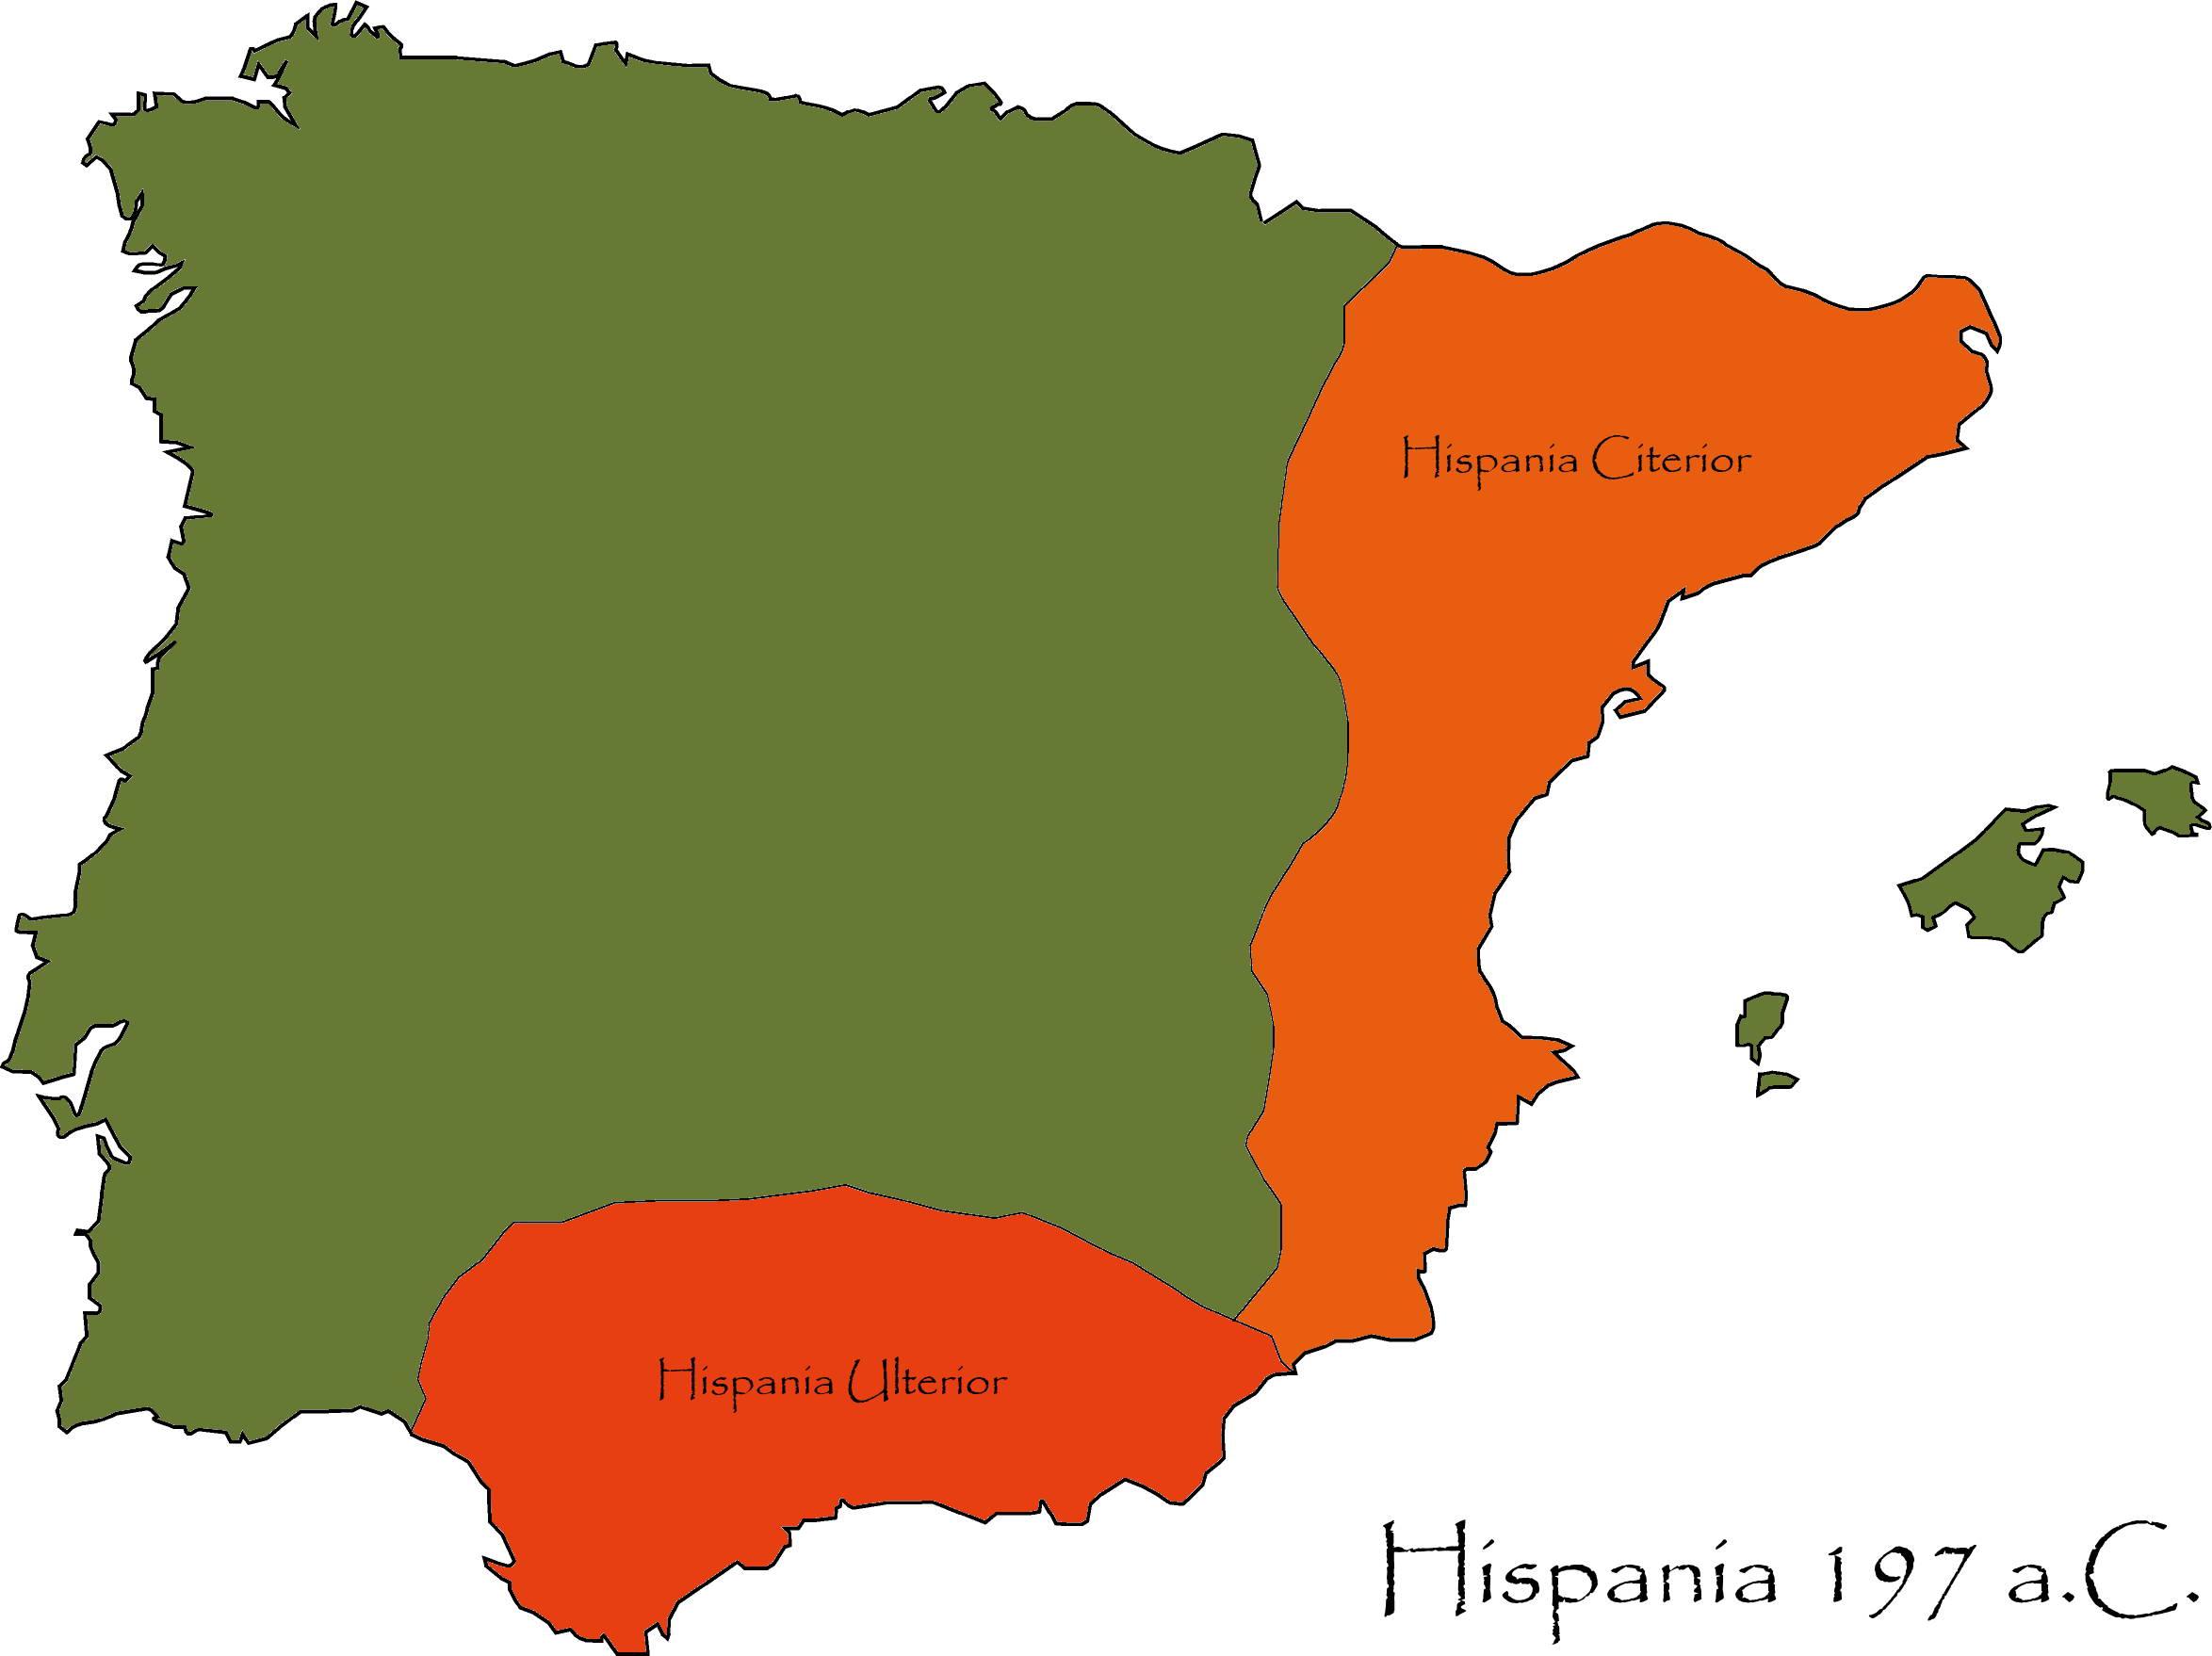 Cartina Spagna Romana.Instoria Province Romane Hispania